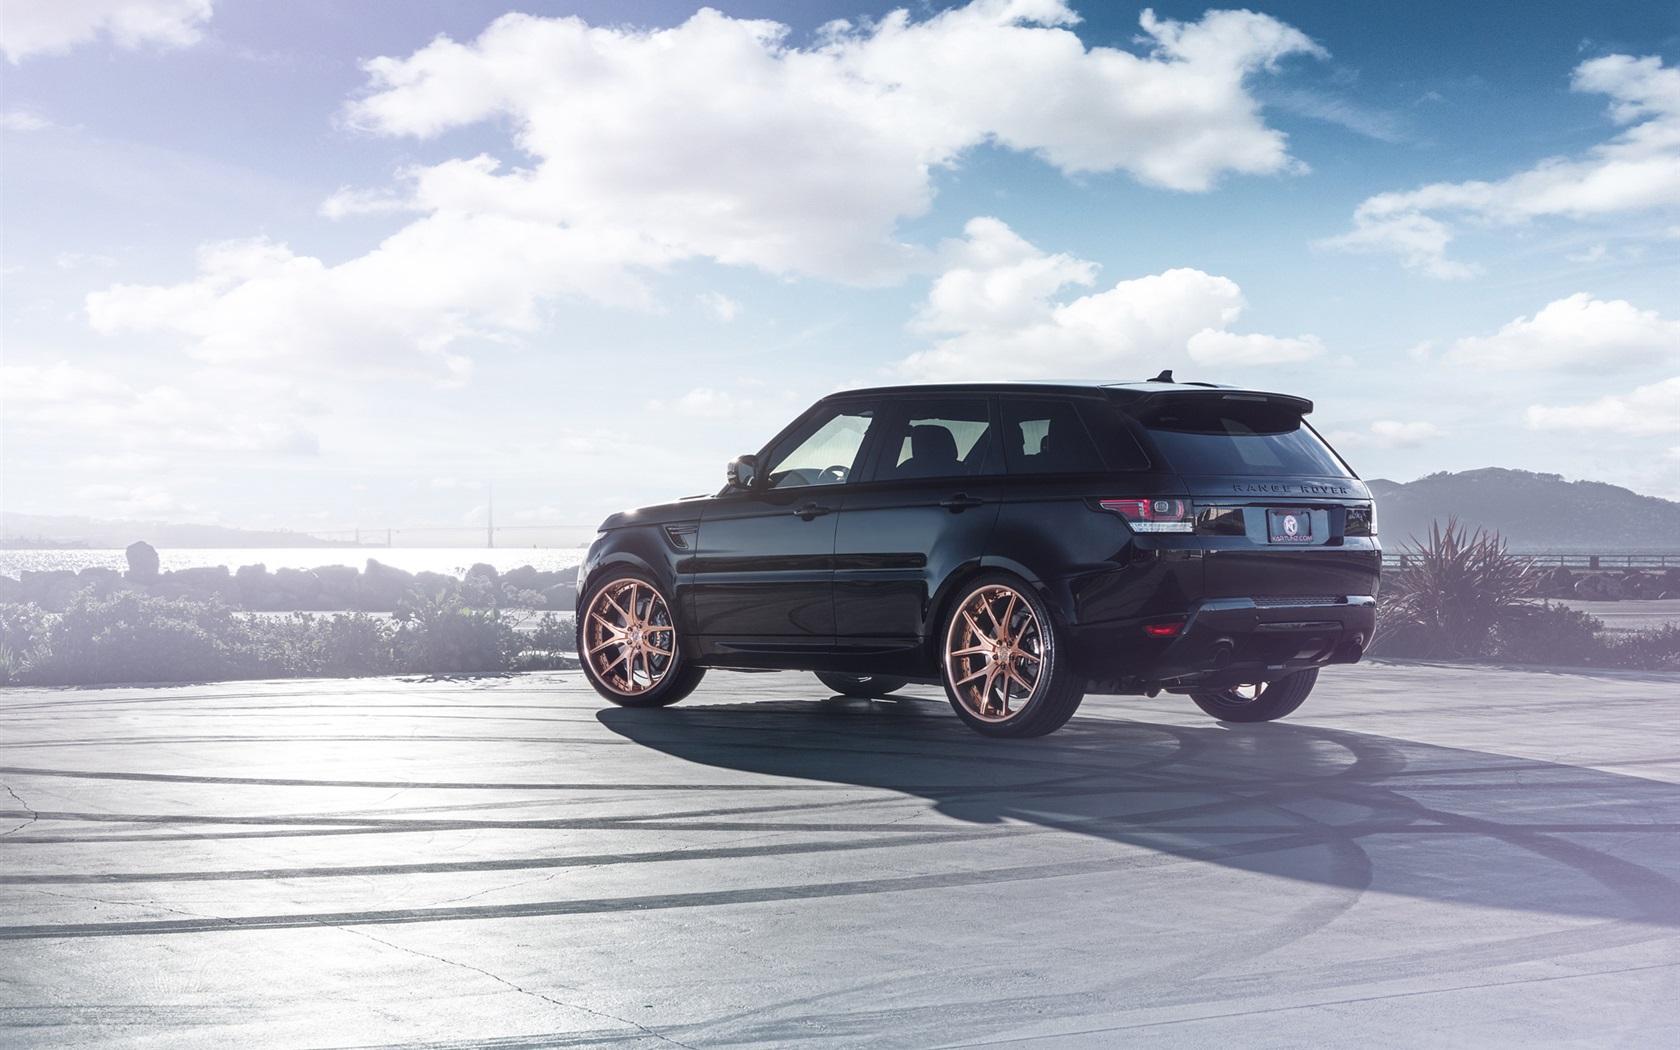 Range Rover Sport Back >> 路虎揽胜桌面壁纸高清-路虎揽胜图片-奔驰高清图片-路虎揽胜电脑桌面壁纸-苹果6手机壁纸图片-宝马7壁纸高清